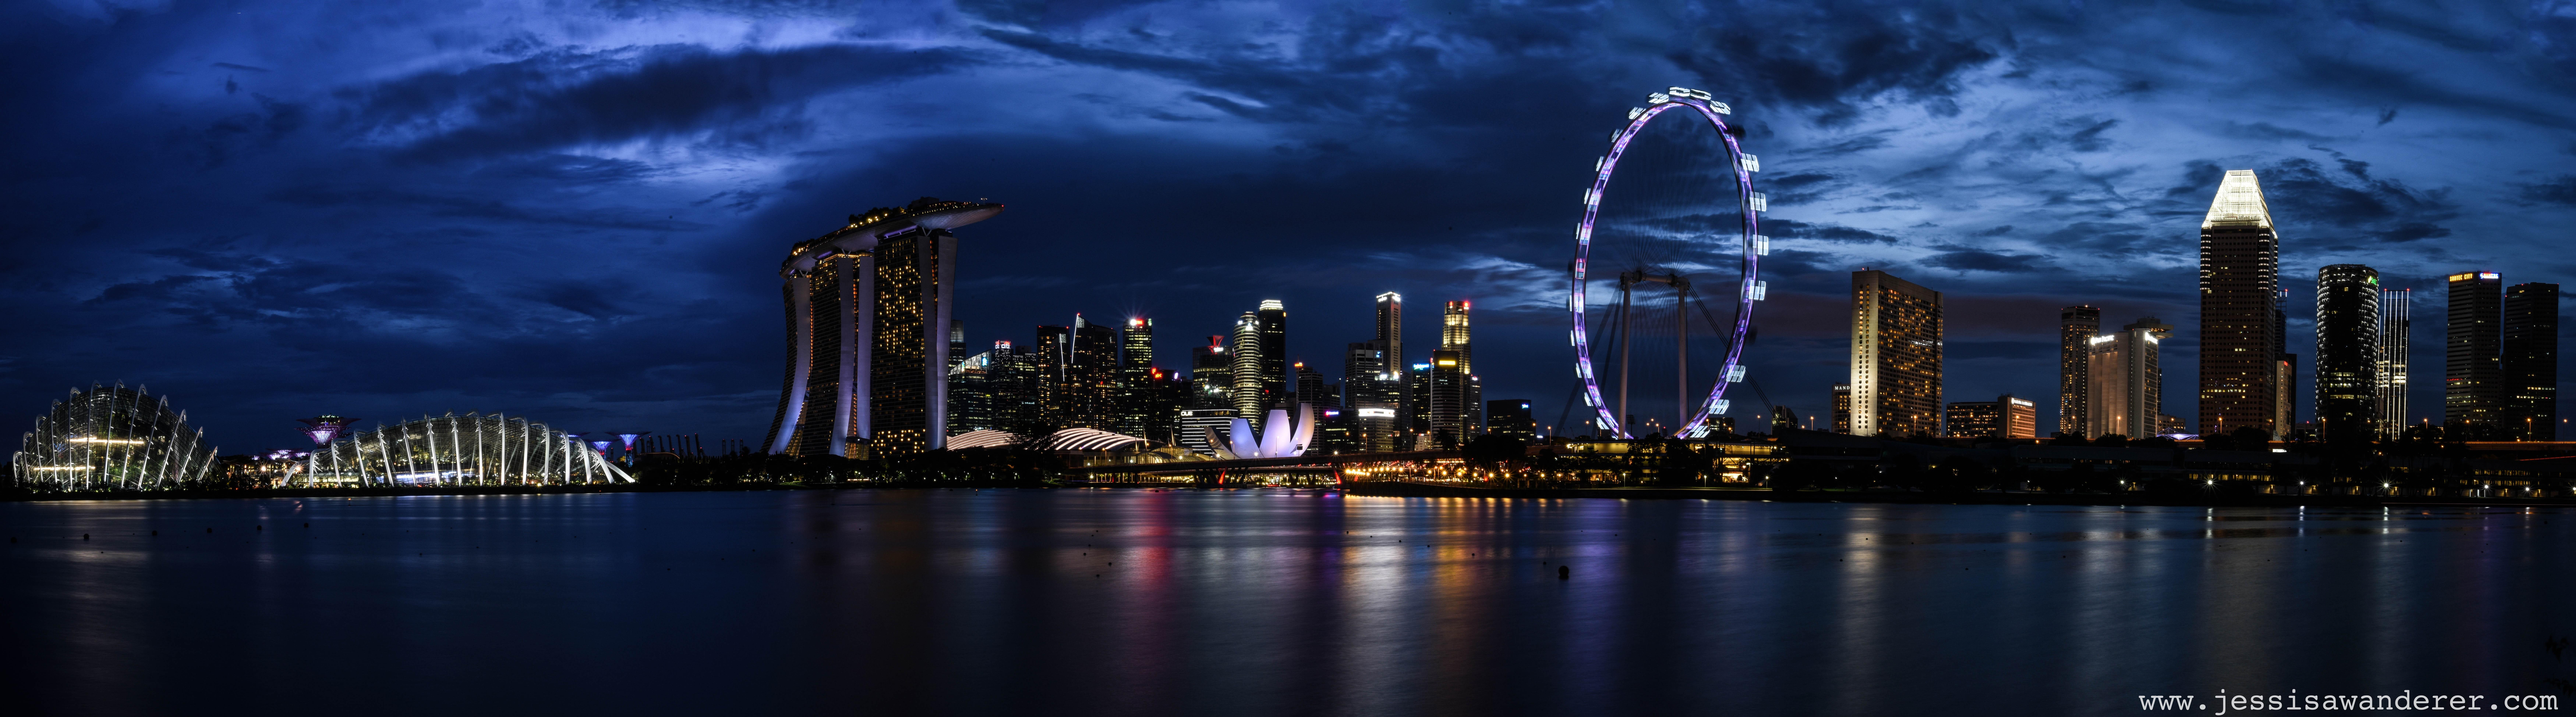 A Moody Sky over Singapore